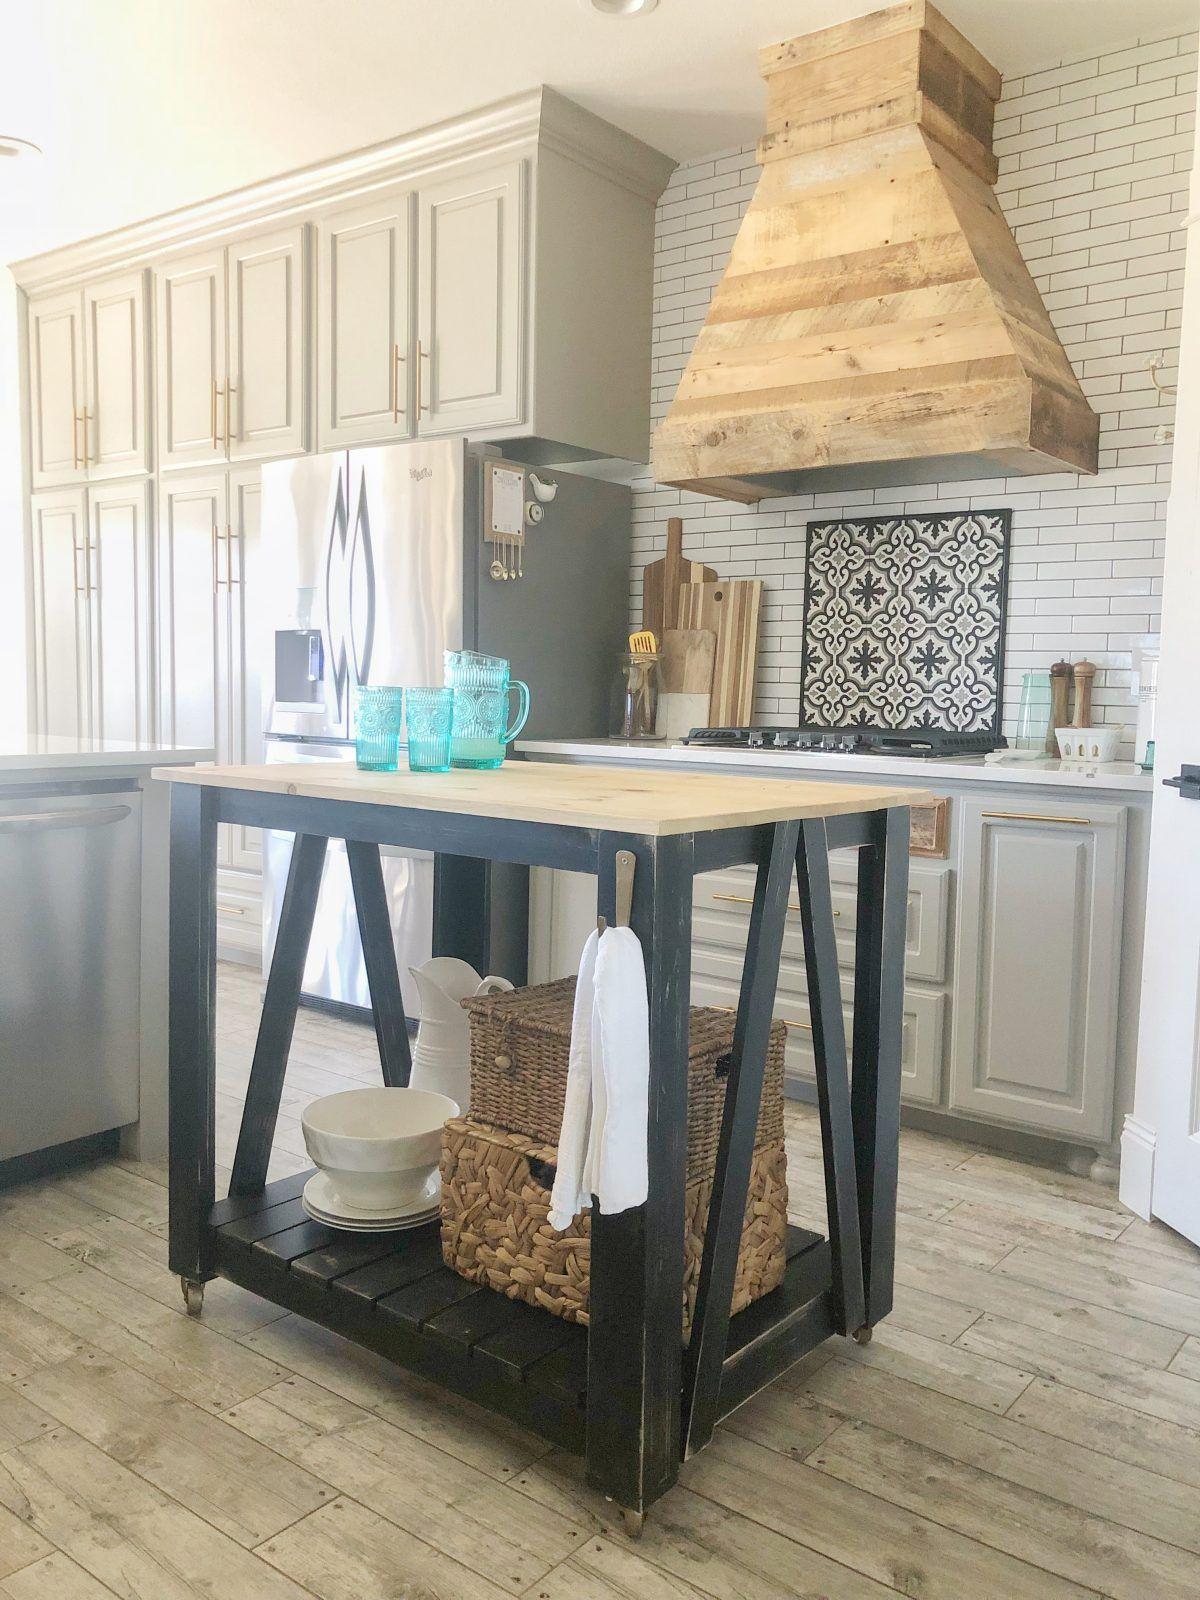 Diy Modern Farmhouse Kitchen Cart Free Plans By Shanty2chic Farmhouse Kitchen Island Portable Kitchen Island Farmhouse Kitchen